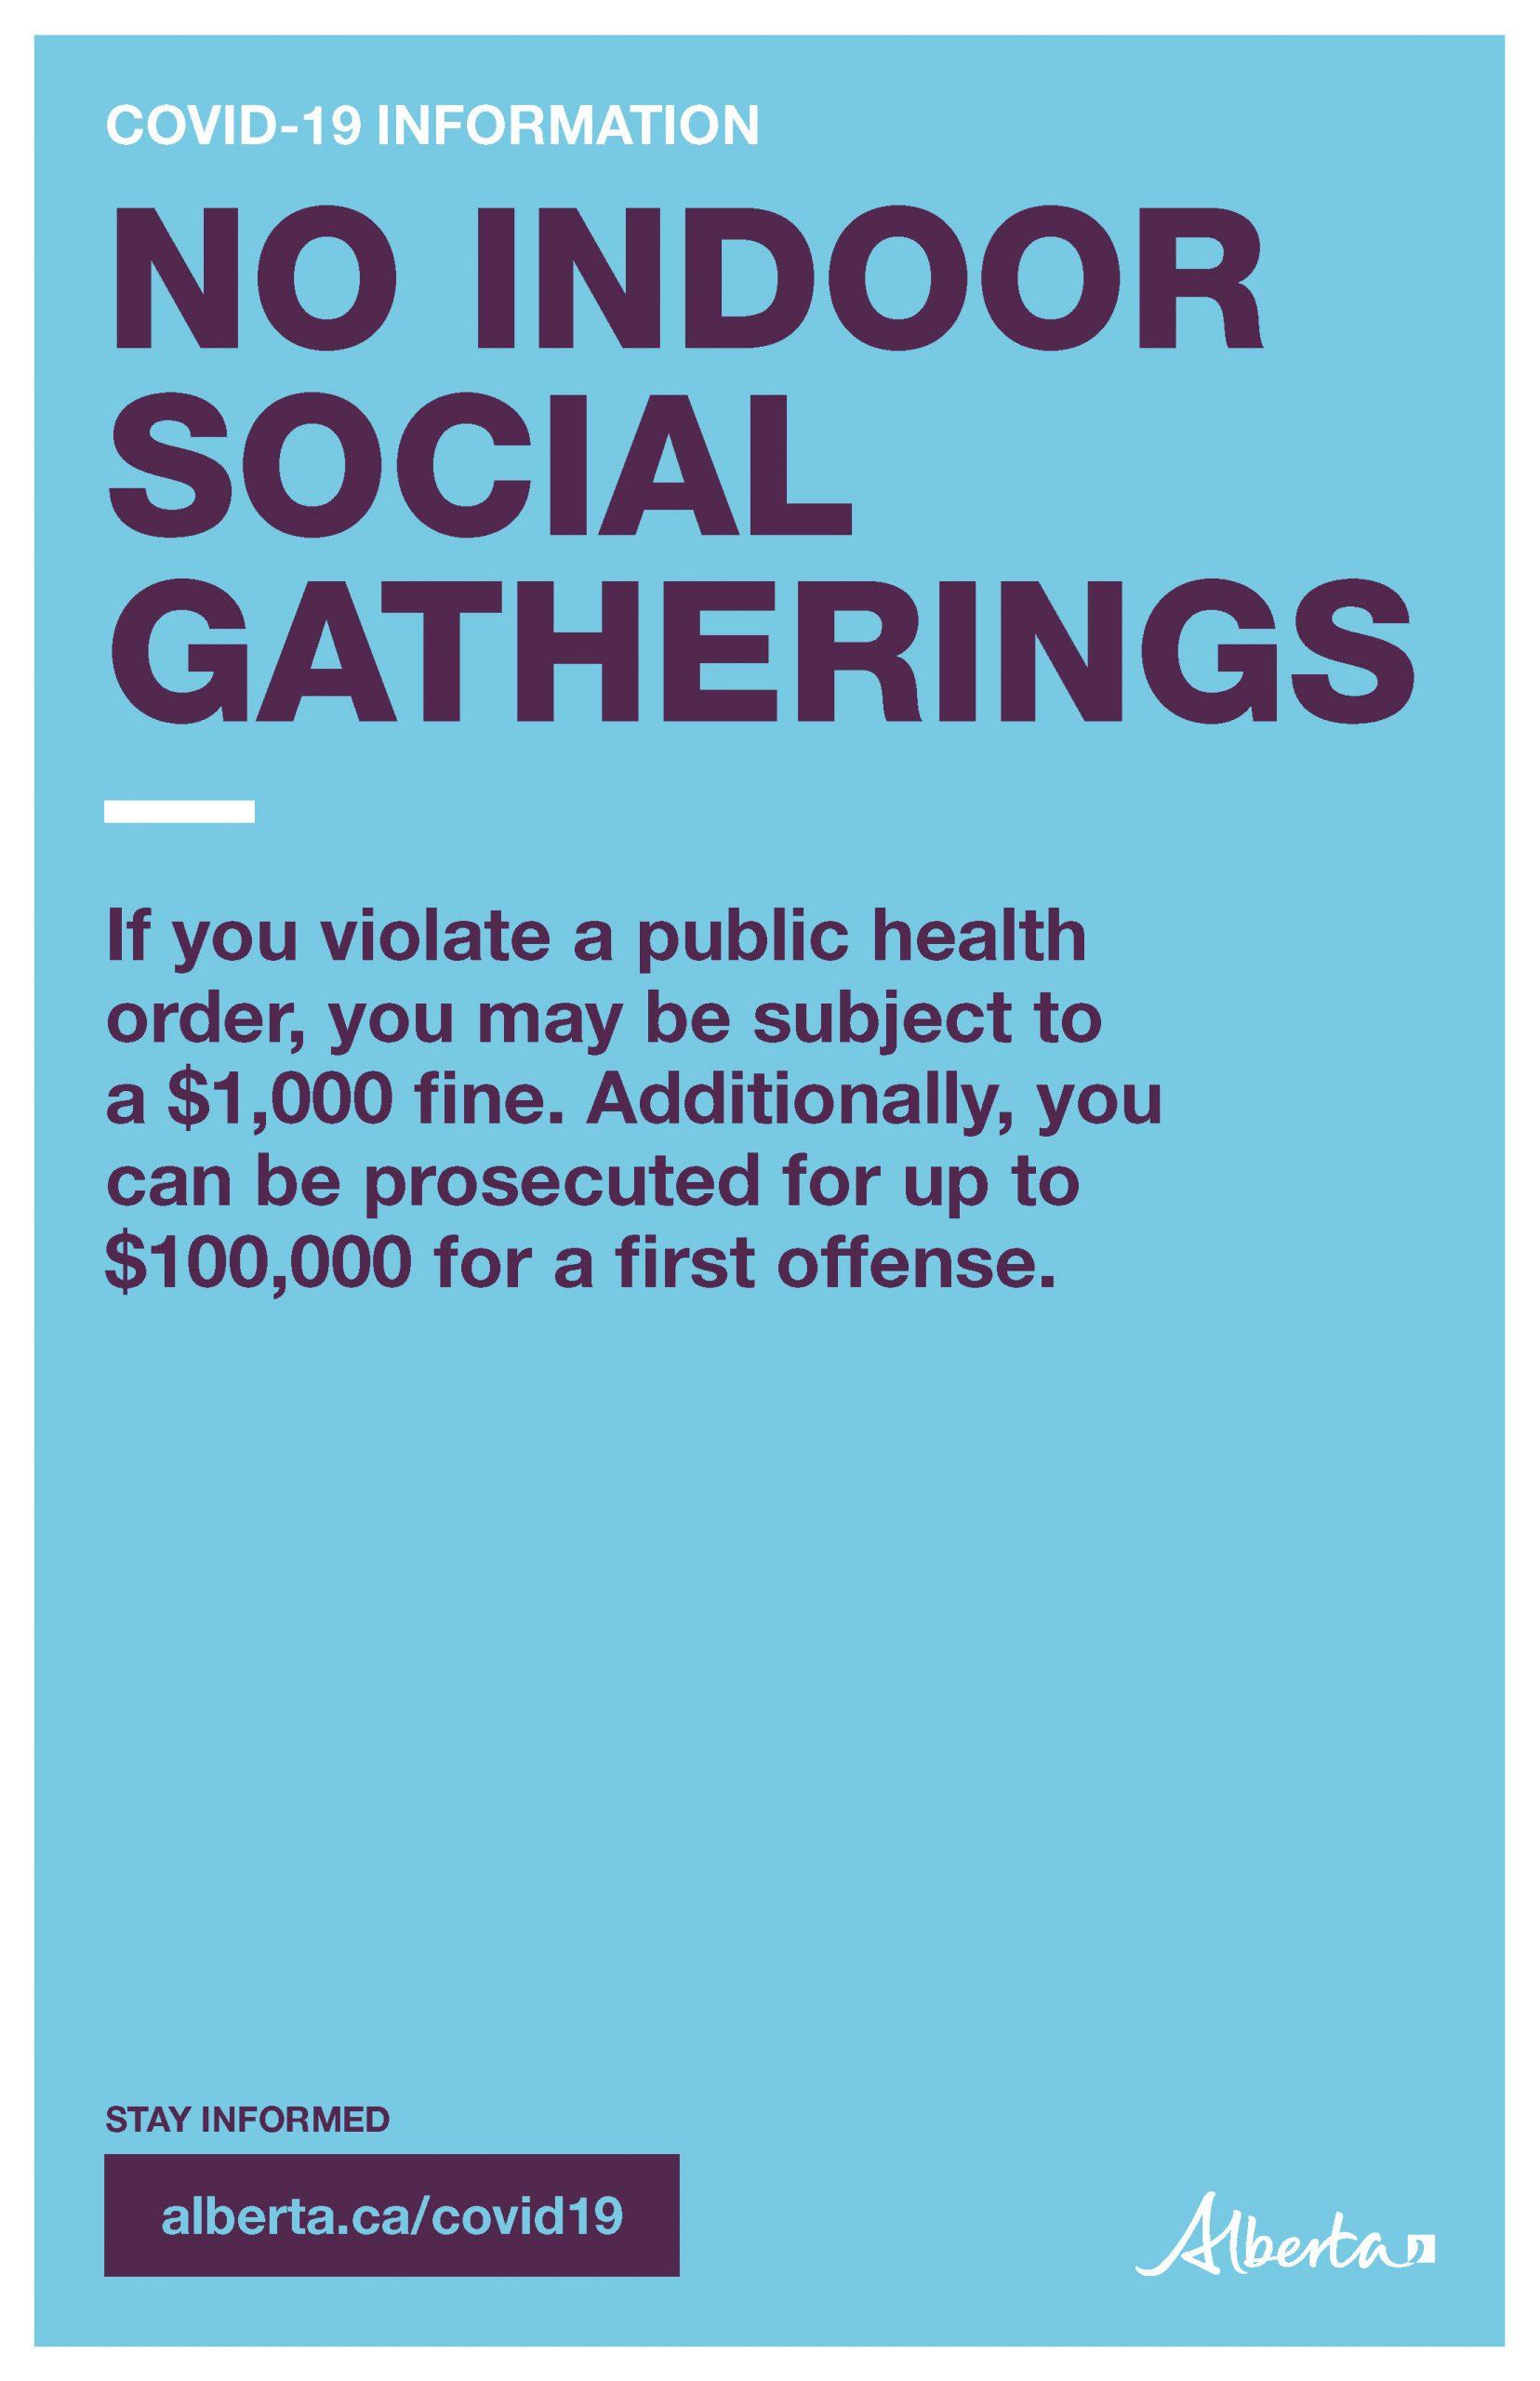 No Indoor Social Gatherings - Poster